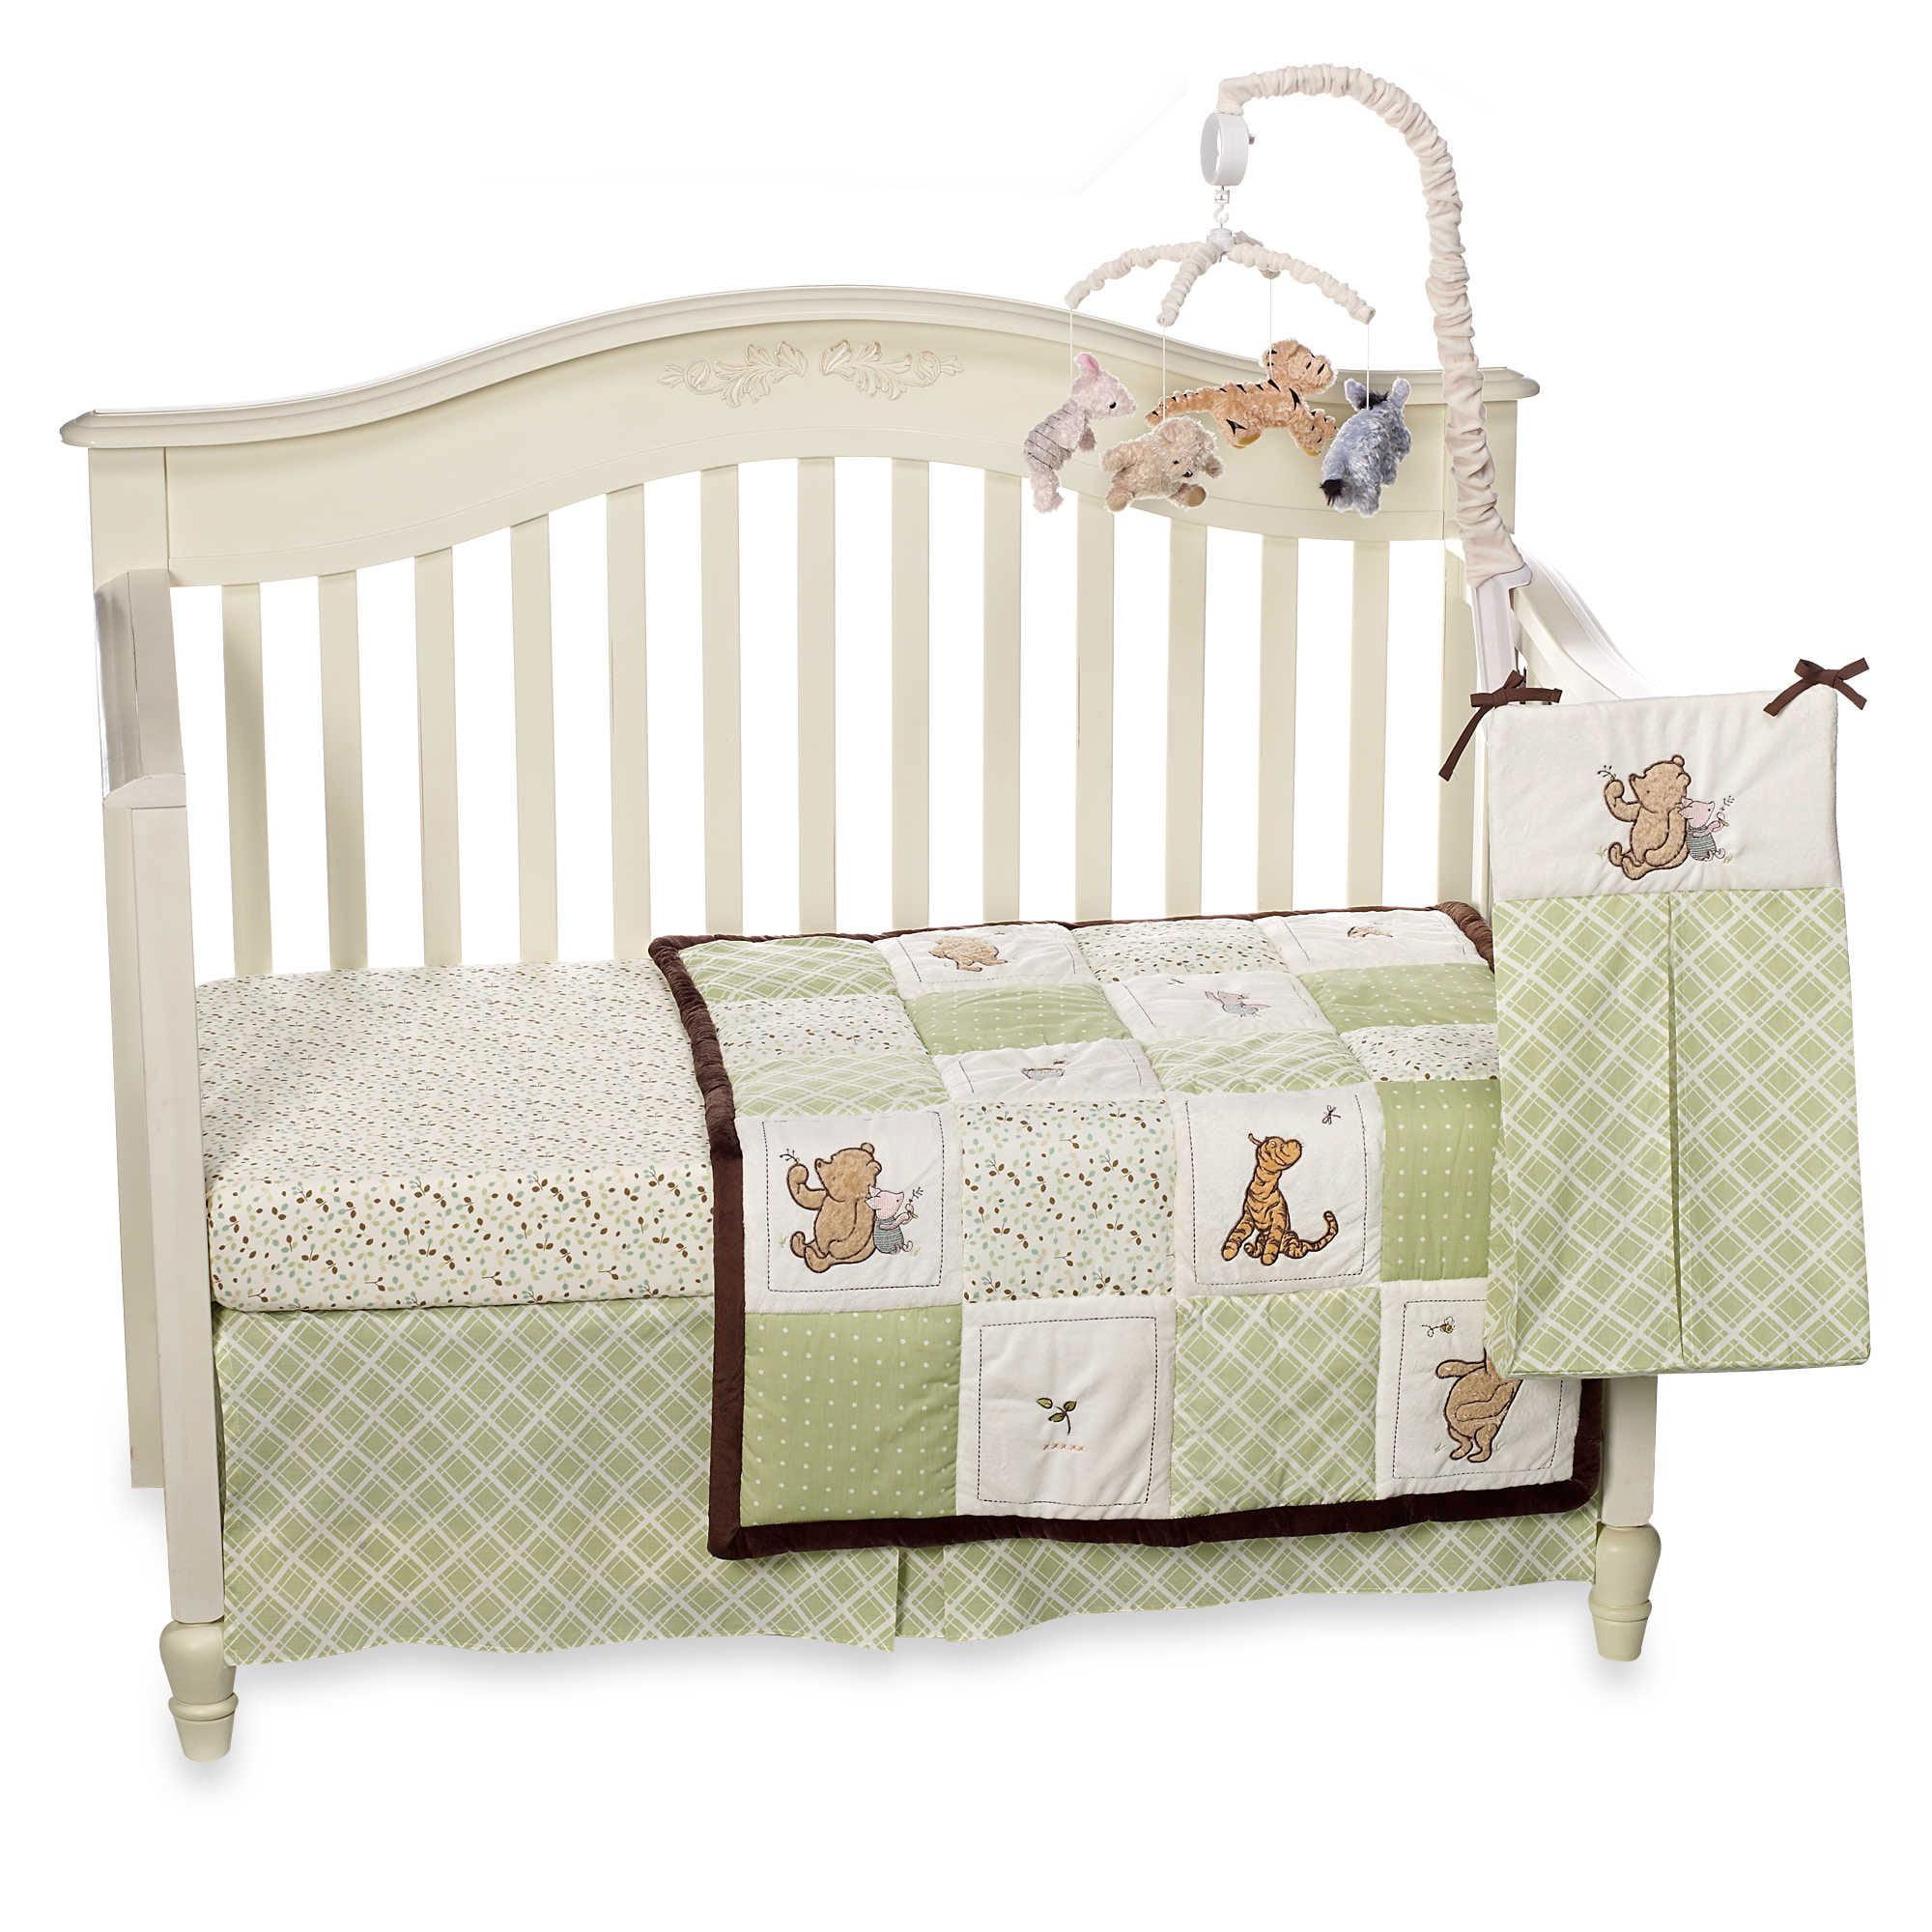 Crown Crafts Baby Crib Bedding Set by Disney - My Friend ...